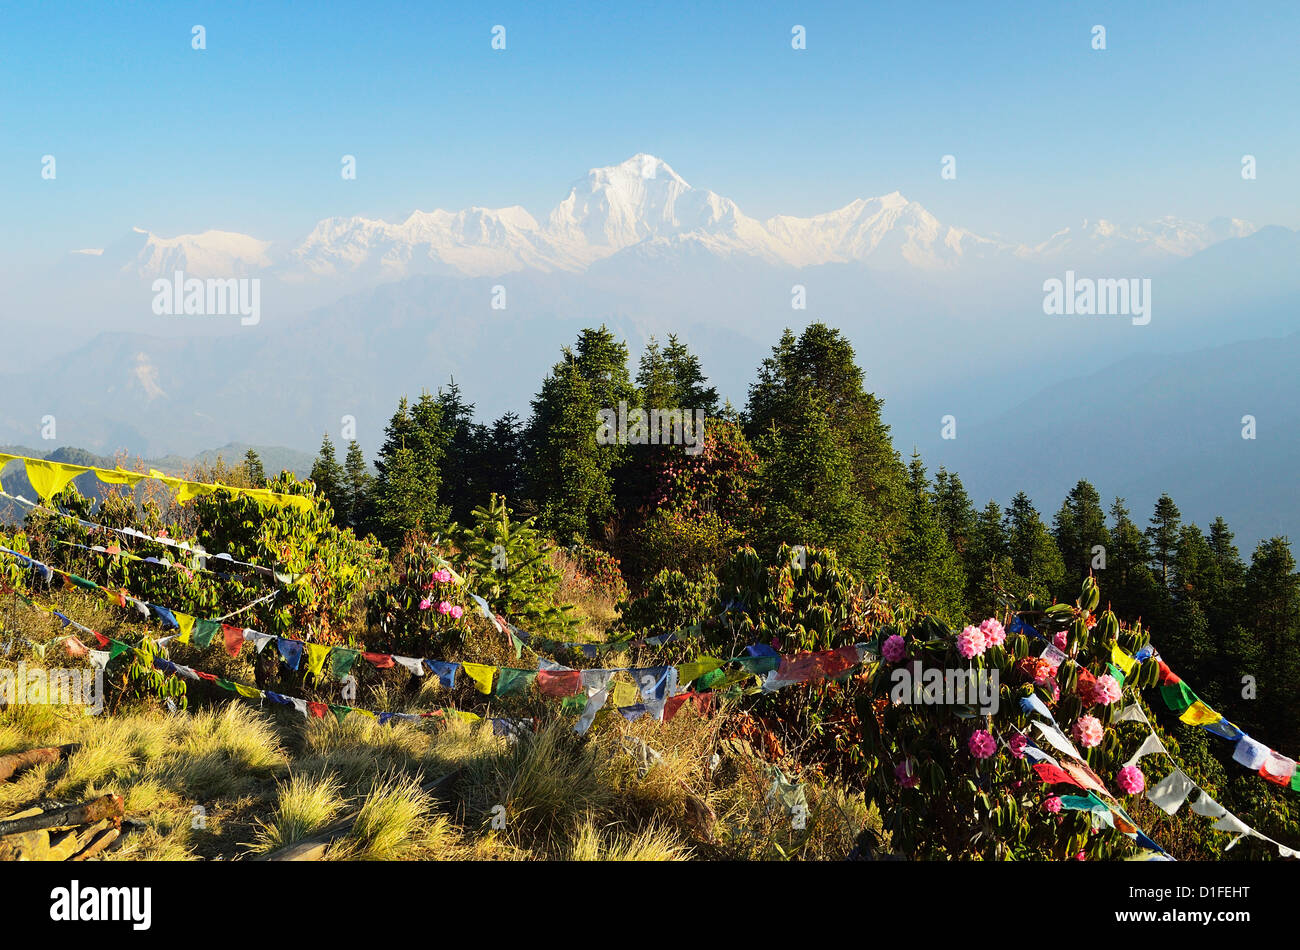 Dhaulagiri Himal seen from Poon Hill, Annapurna Conservation Area, Dhawalagiri (Dhaulagiri), Western Region, Nepal - Stock Image